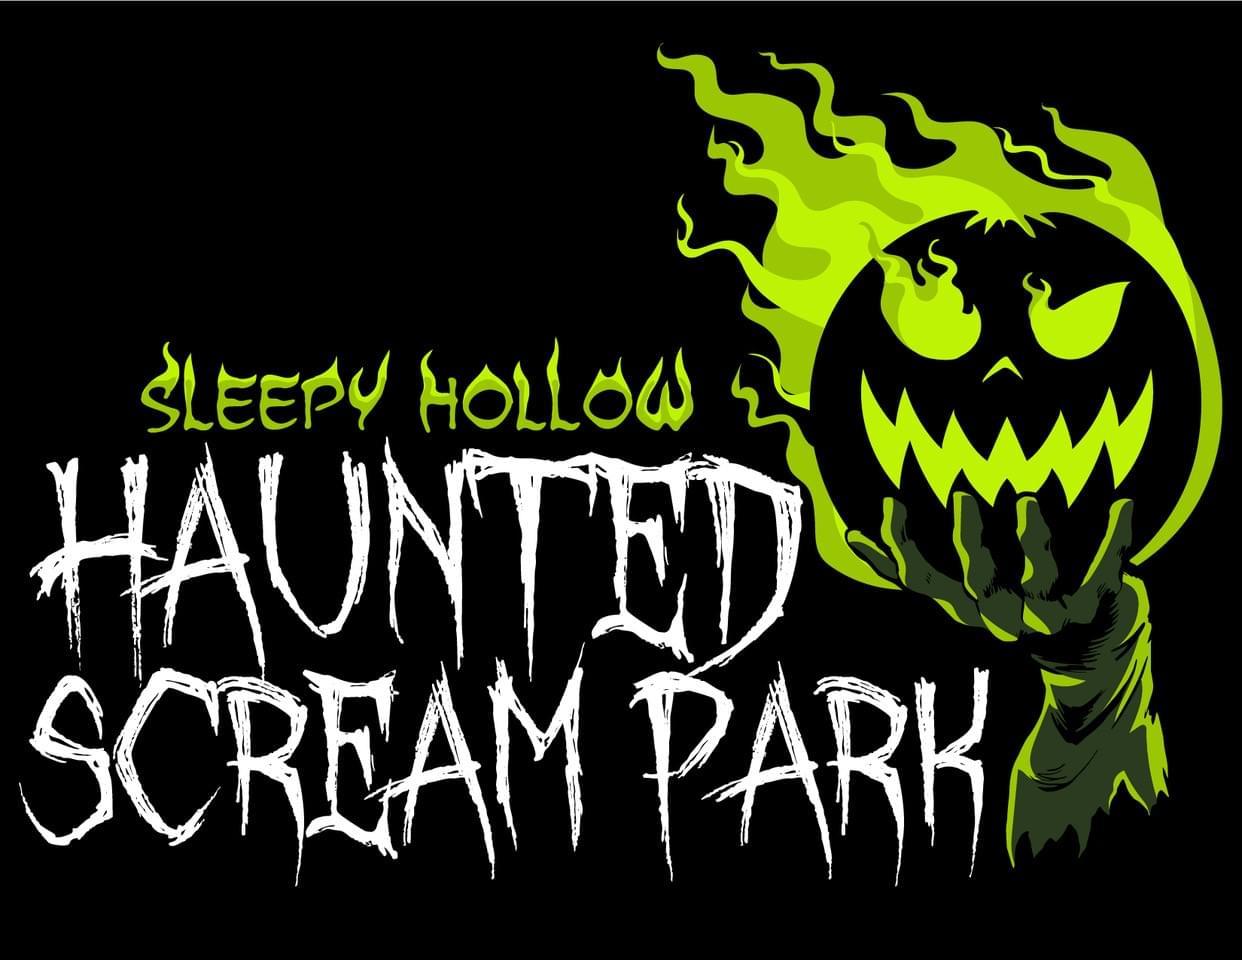 Haunted Scream Park Sweepstakes